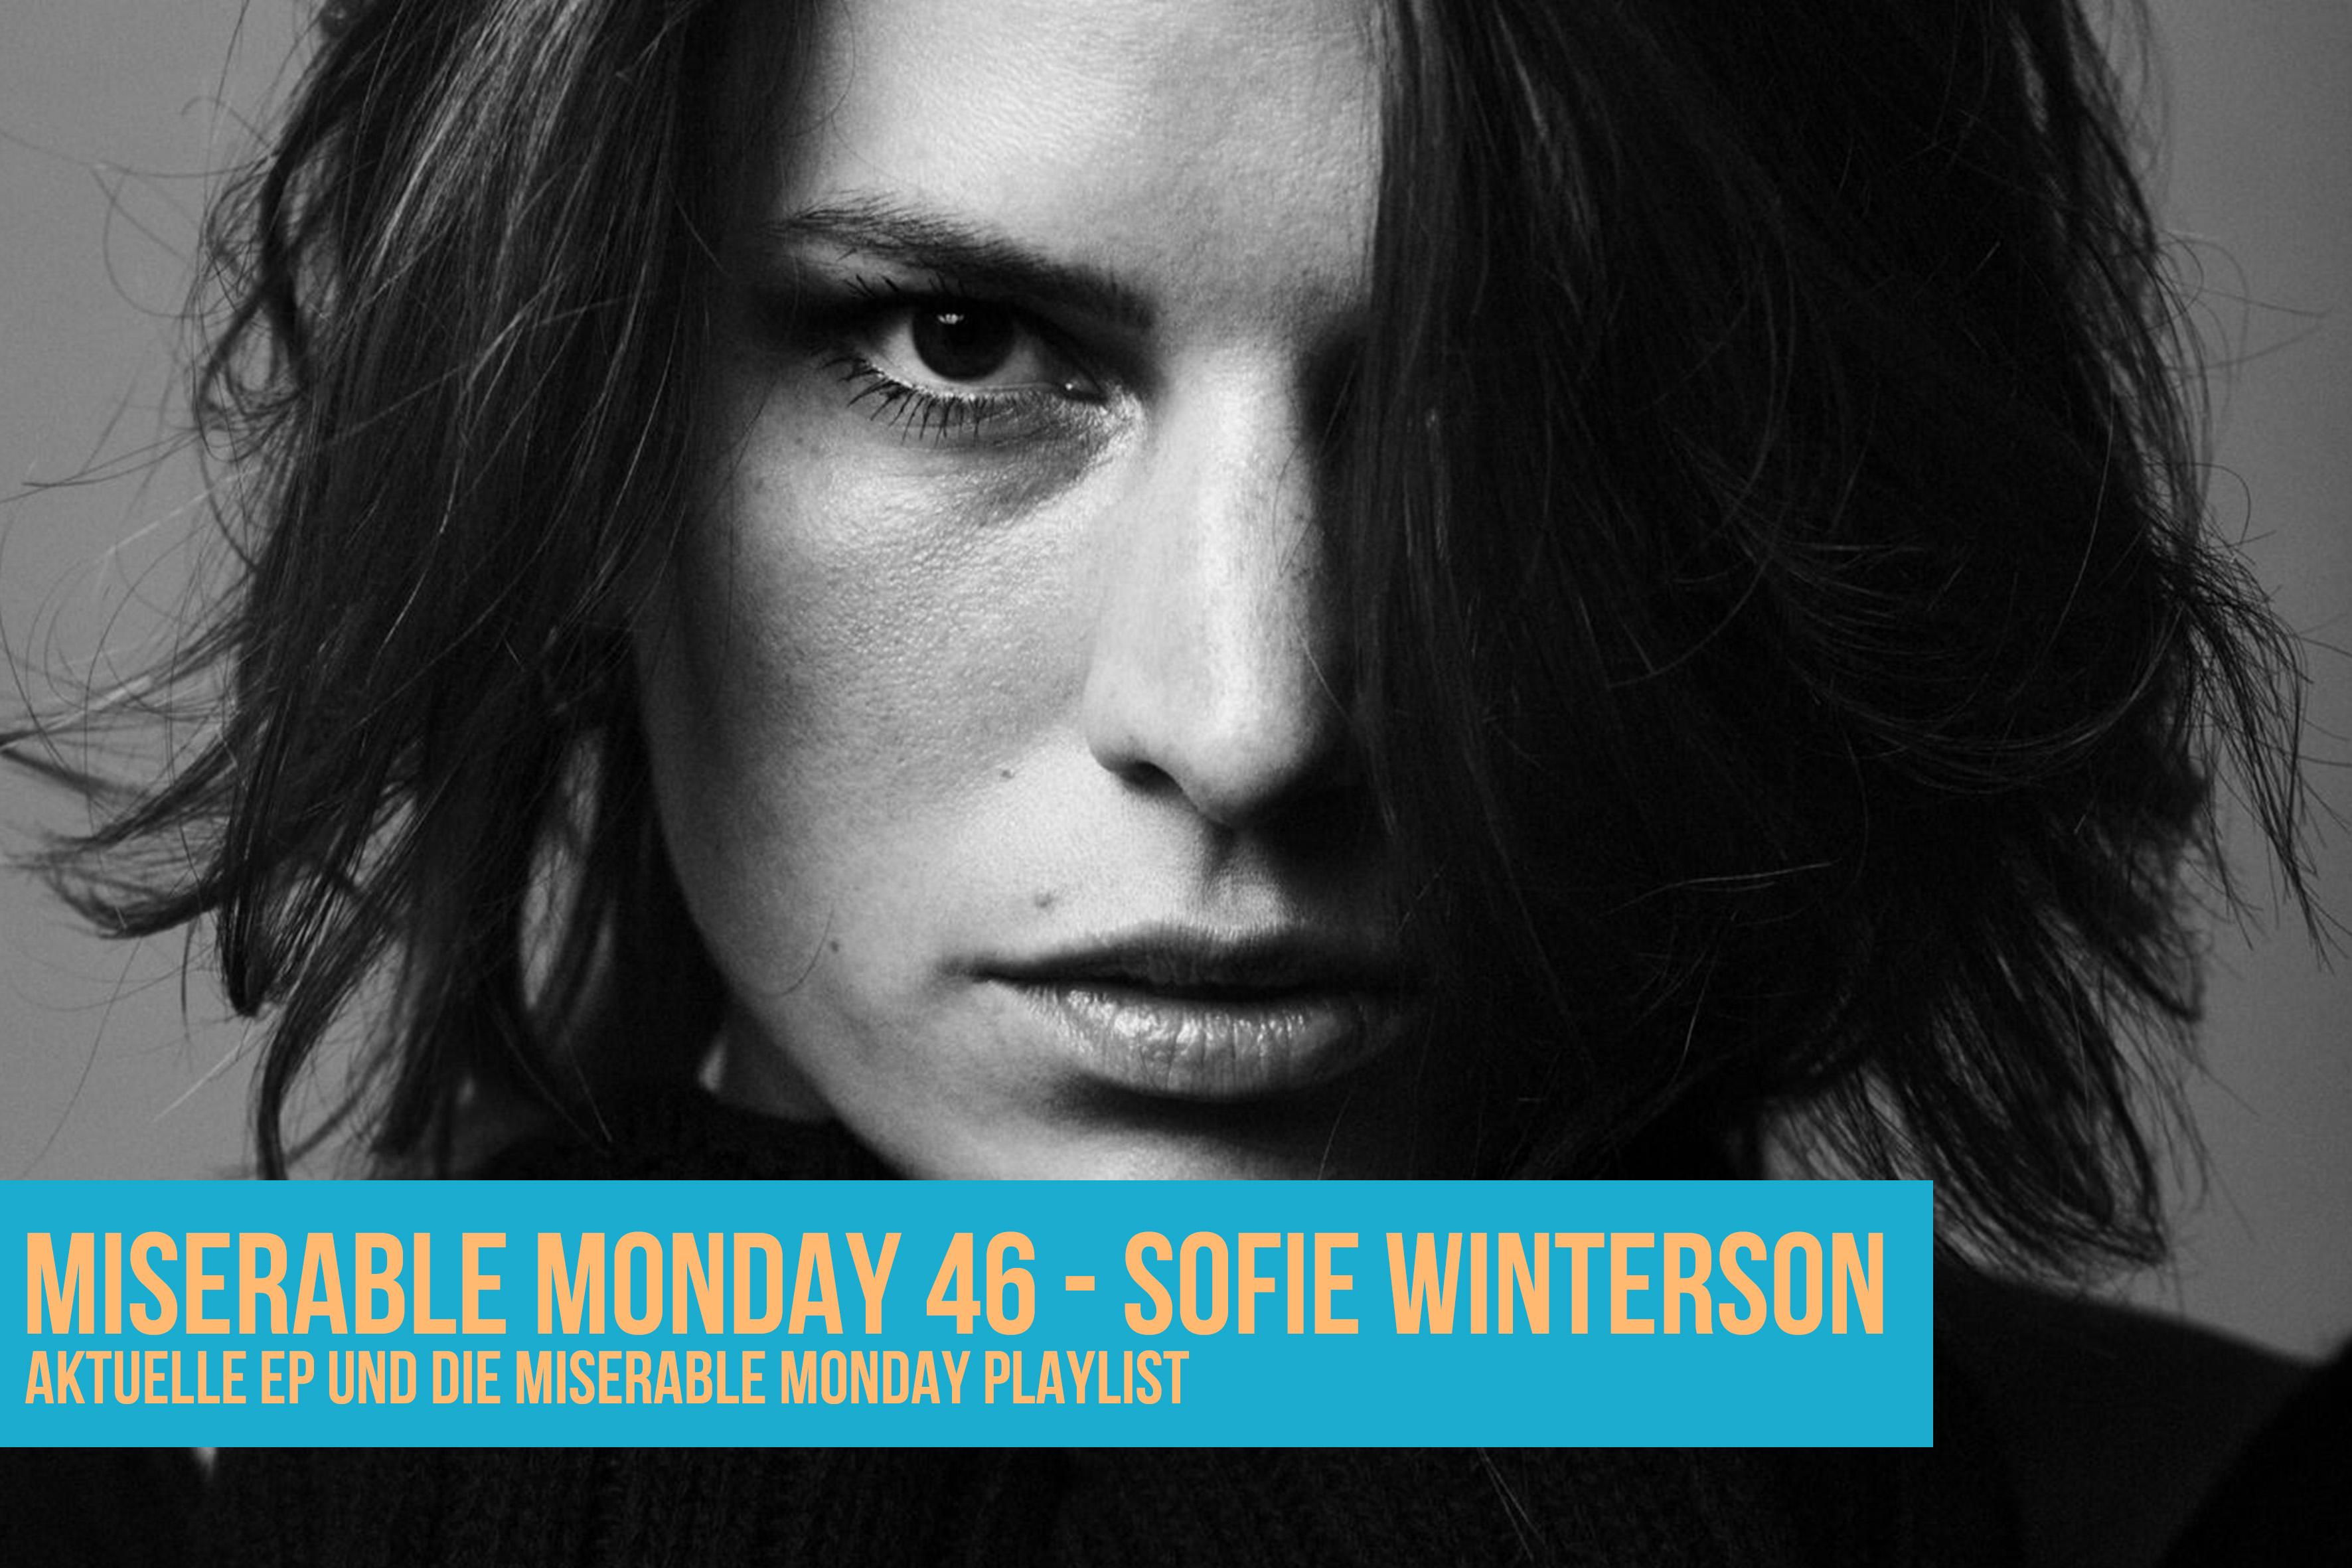 046 - Sofie Winterson